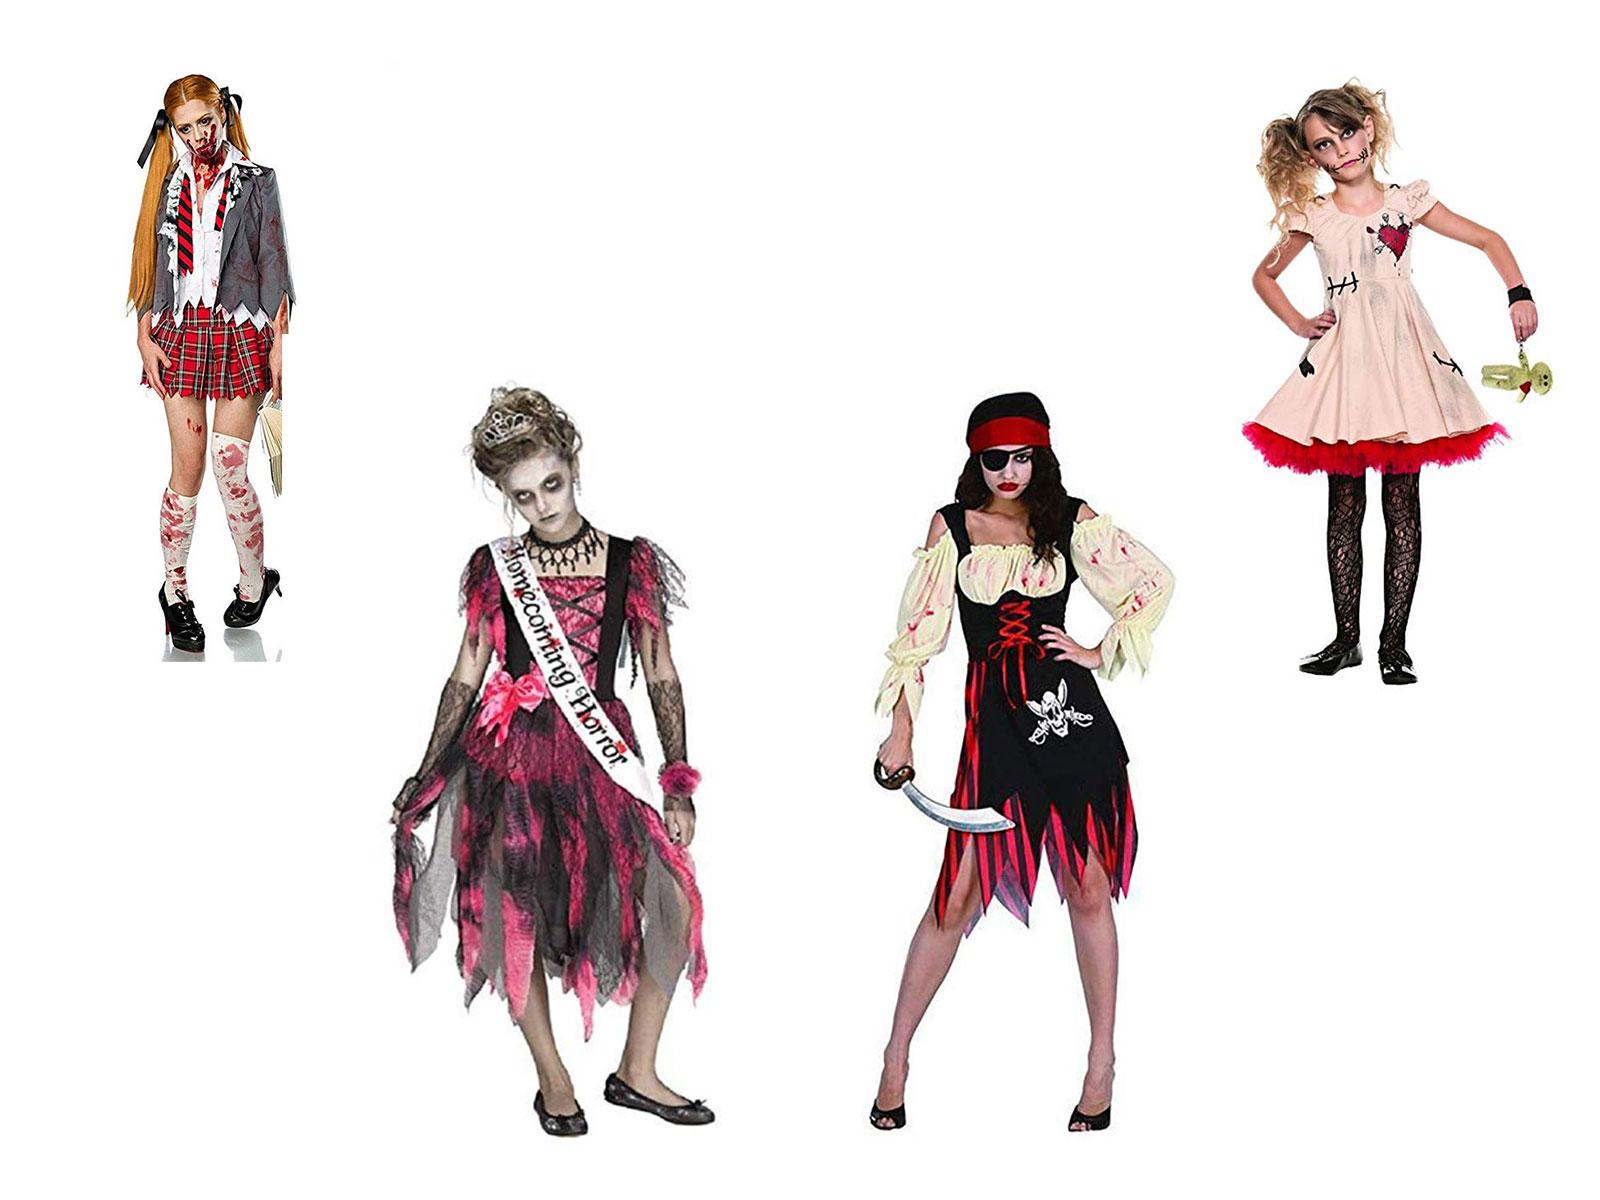 20 Scary & Creepy Halloween The Walking Dead Costume Ideas